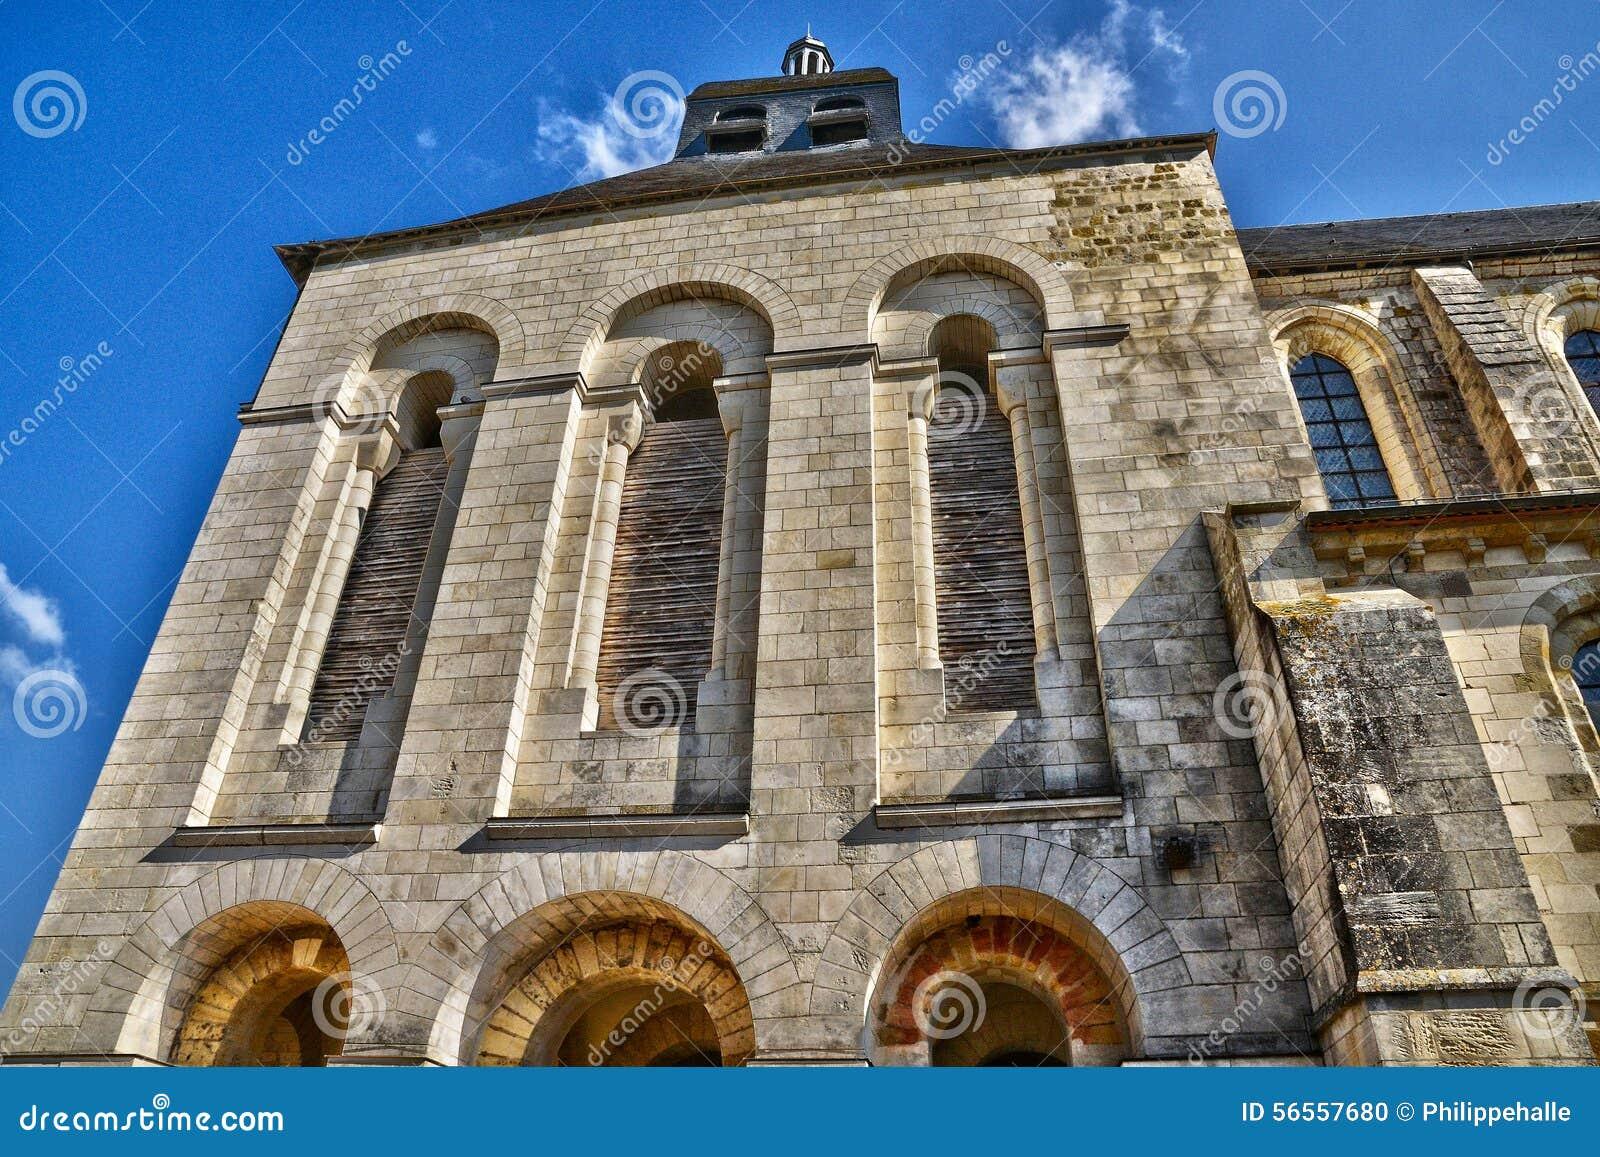 Download Γραφική πόλη Αγίου Benoit Sur Loire στο Val-de-Loire Στοκ Εικόνες - εικόνα από ευρώπη, romanesque: 56557680